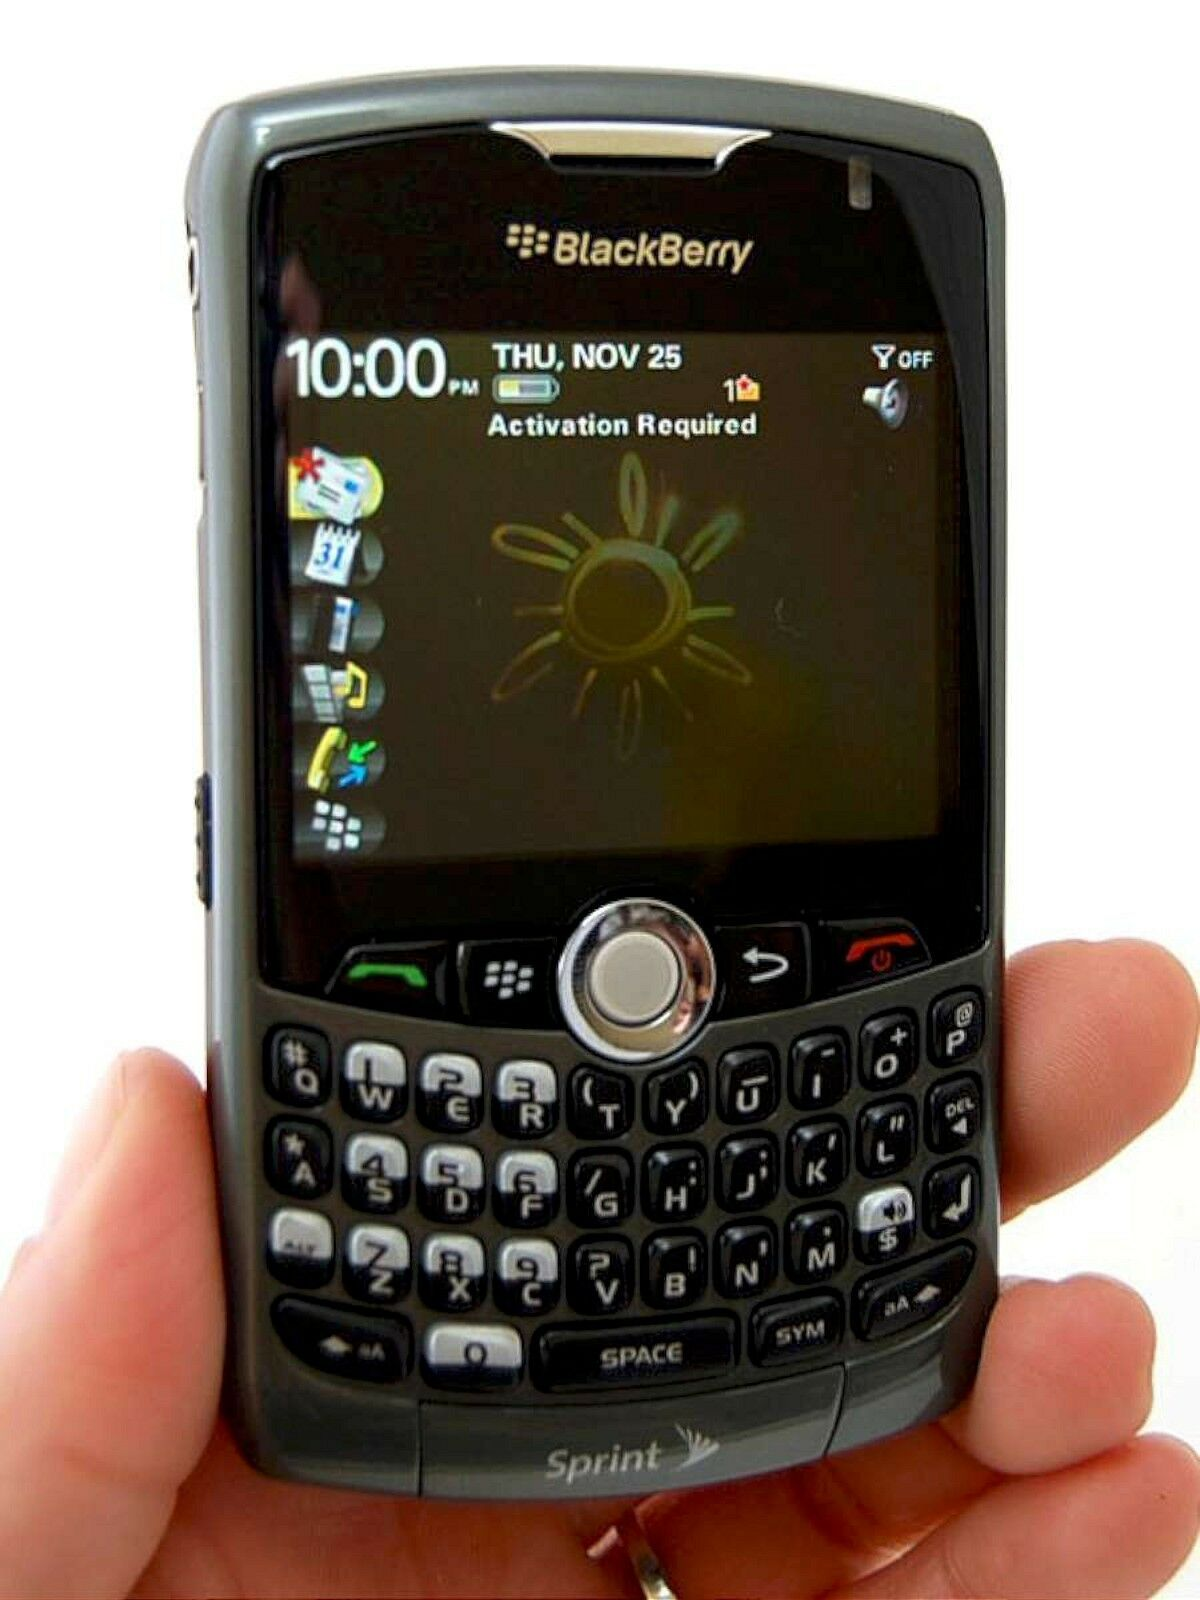 new blackberry curve 8330 sprint 3g cell phone titanium gray rim rh ebay com Sprint BlackBerry Curve Phones Sprint Smartphones